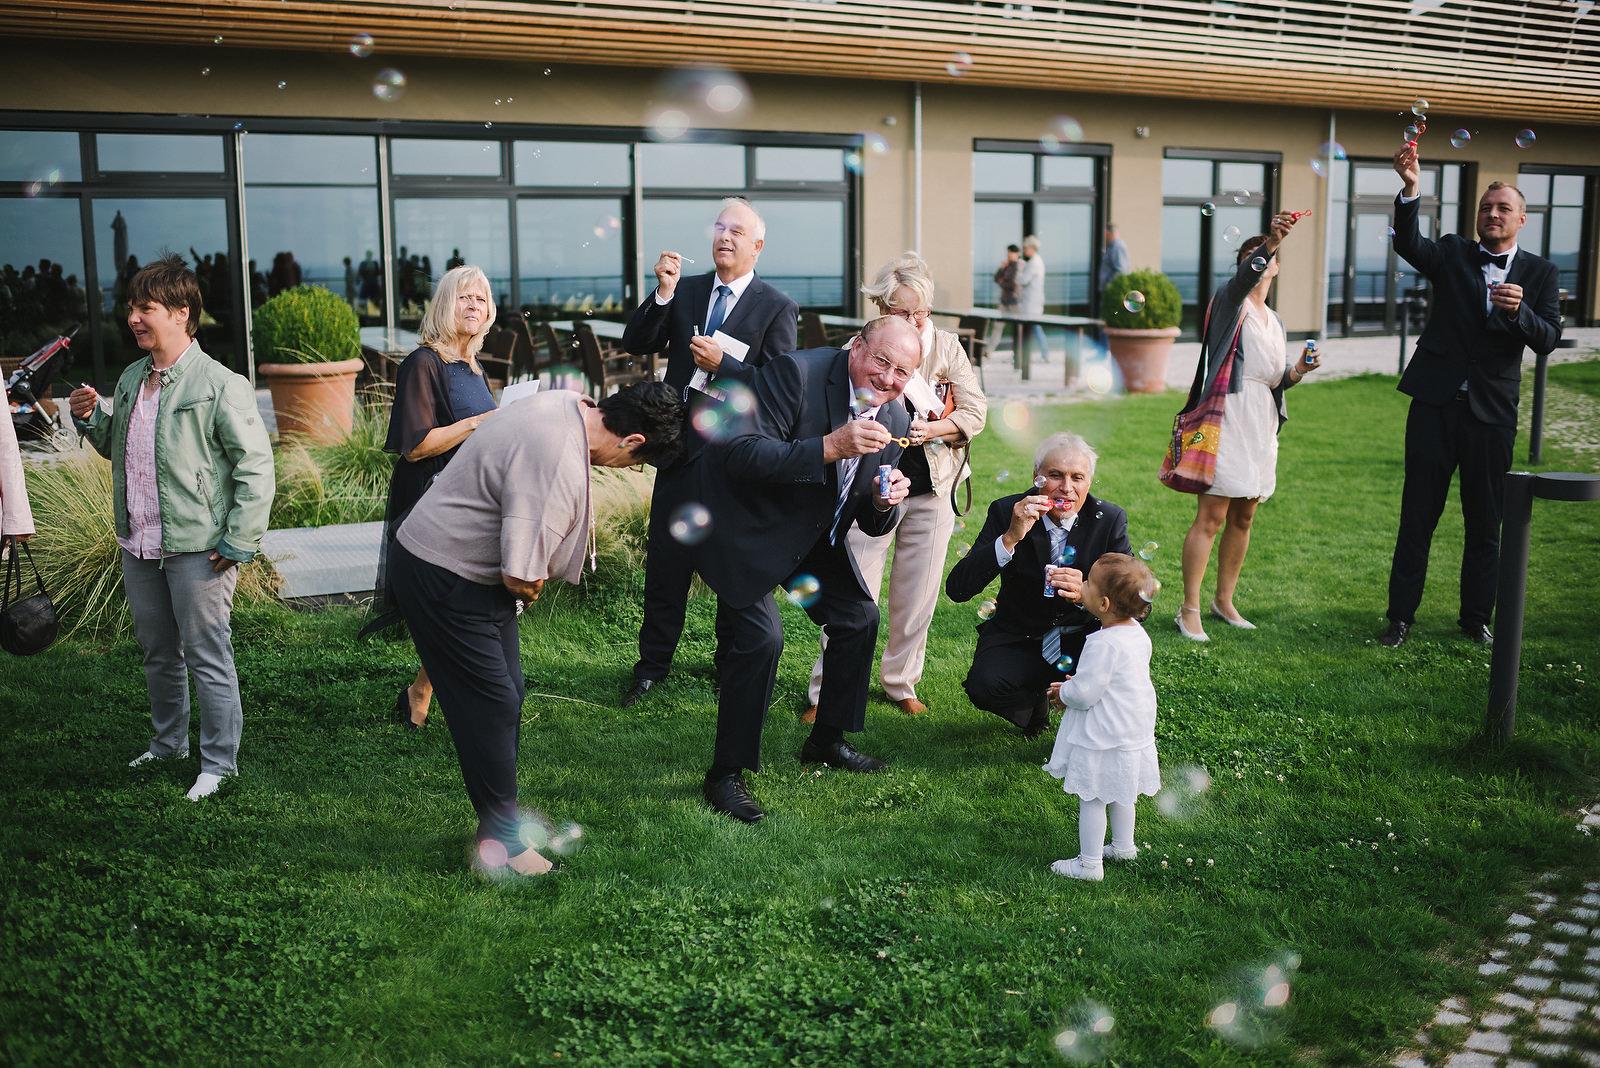 Fotograf Konstanz - Hochzeitsfotograf Reutlingen Achalm Hochzeit EFP 65 - Als Hochzeitsfotograf auf der Achalm, Reutlingen  - 51 -